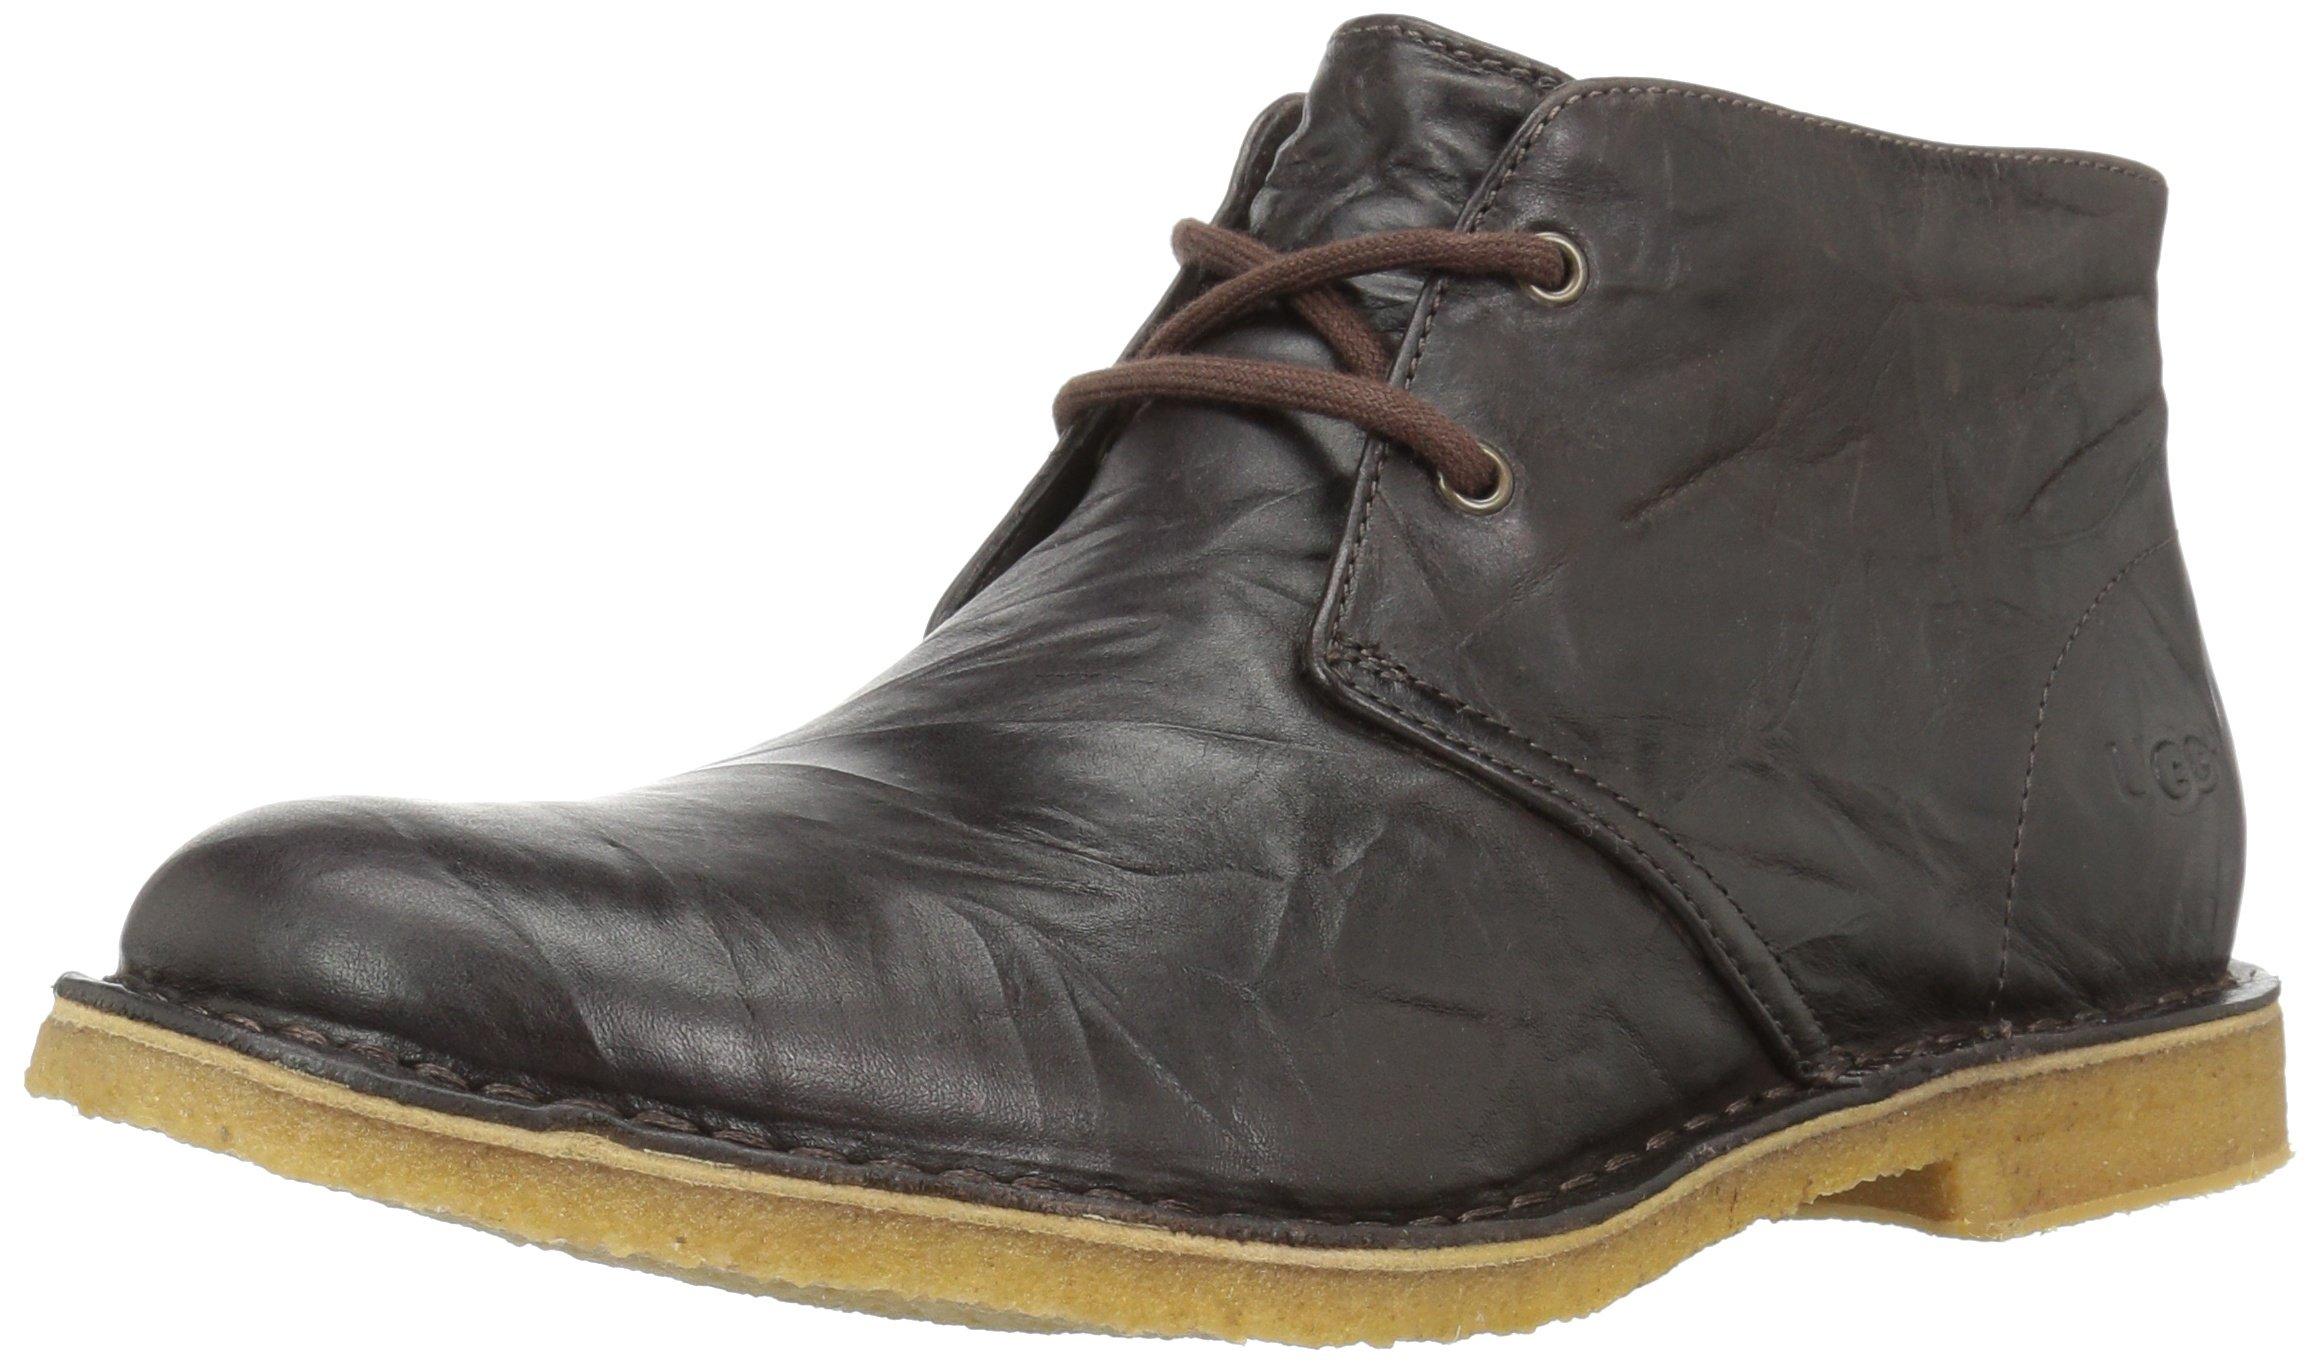 UGG Men's Leighton Chukka Boot, Chocolate, 11.5 US/11.5 M US